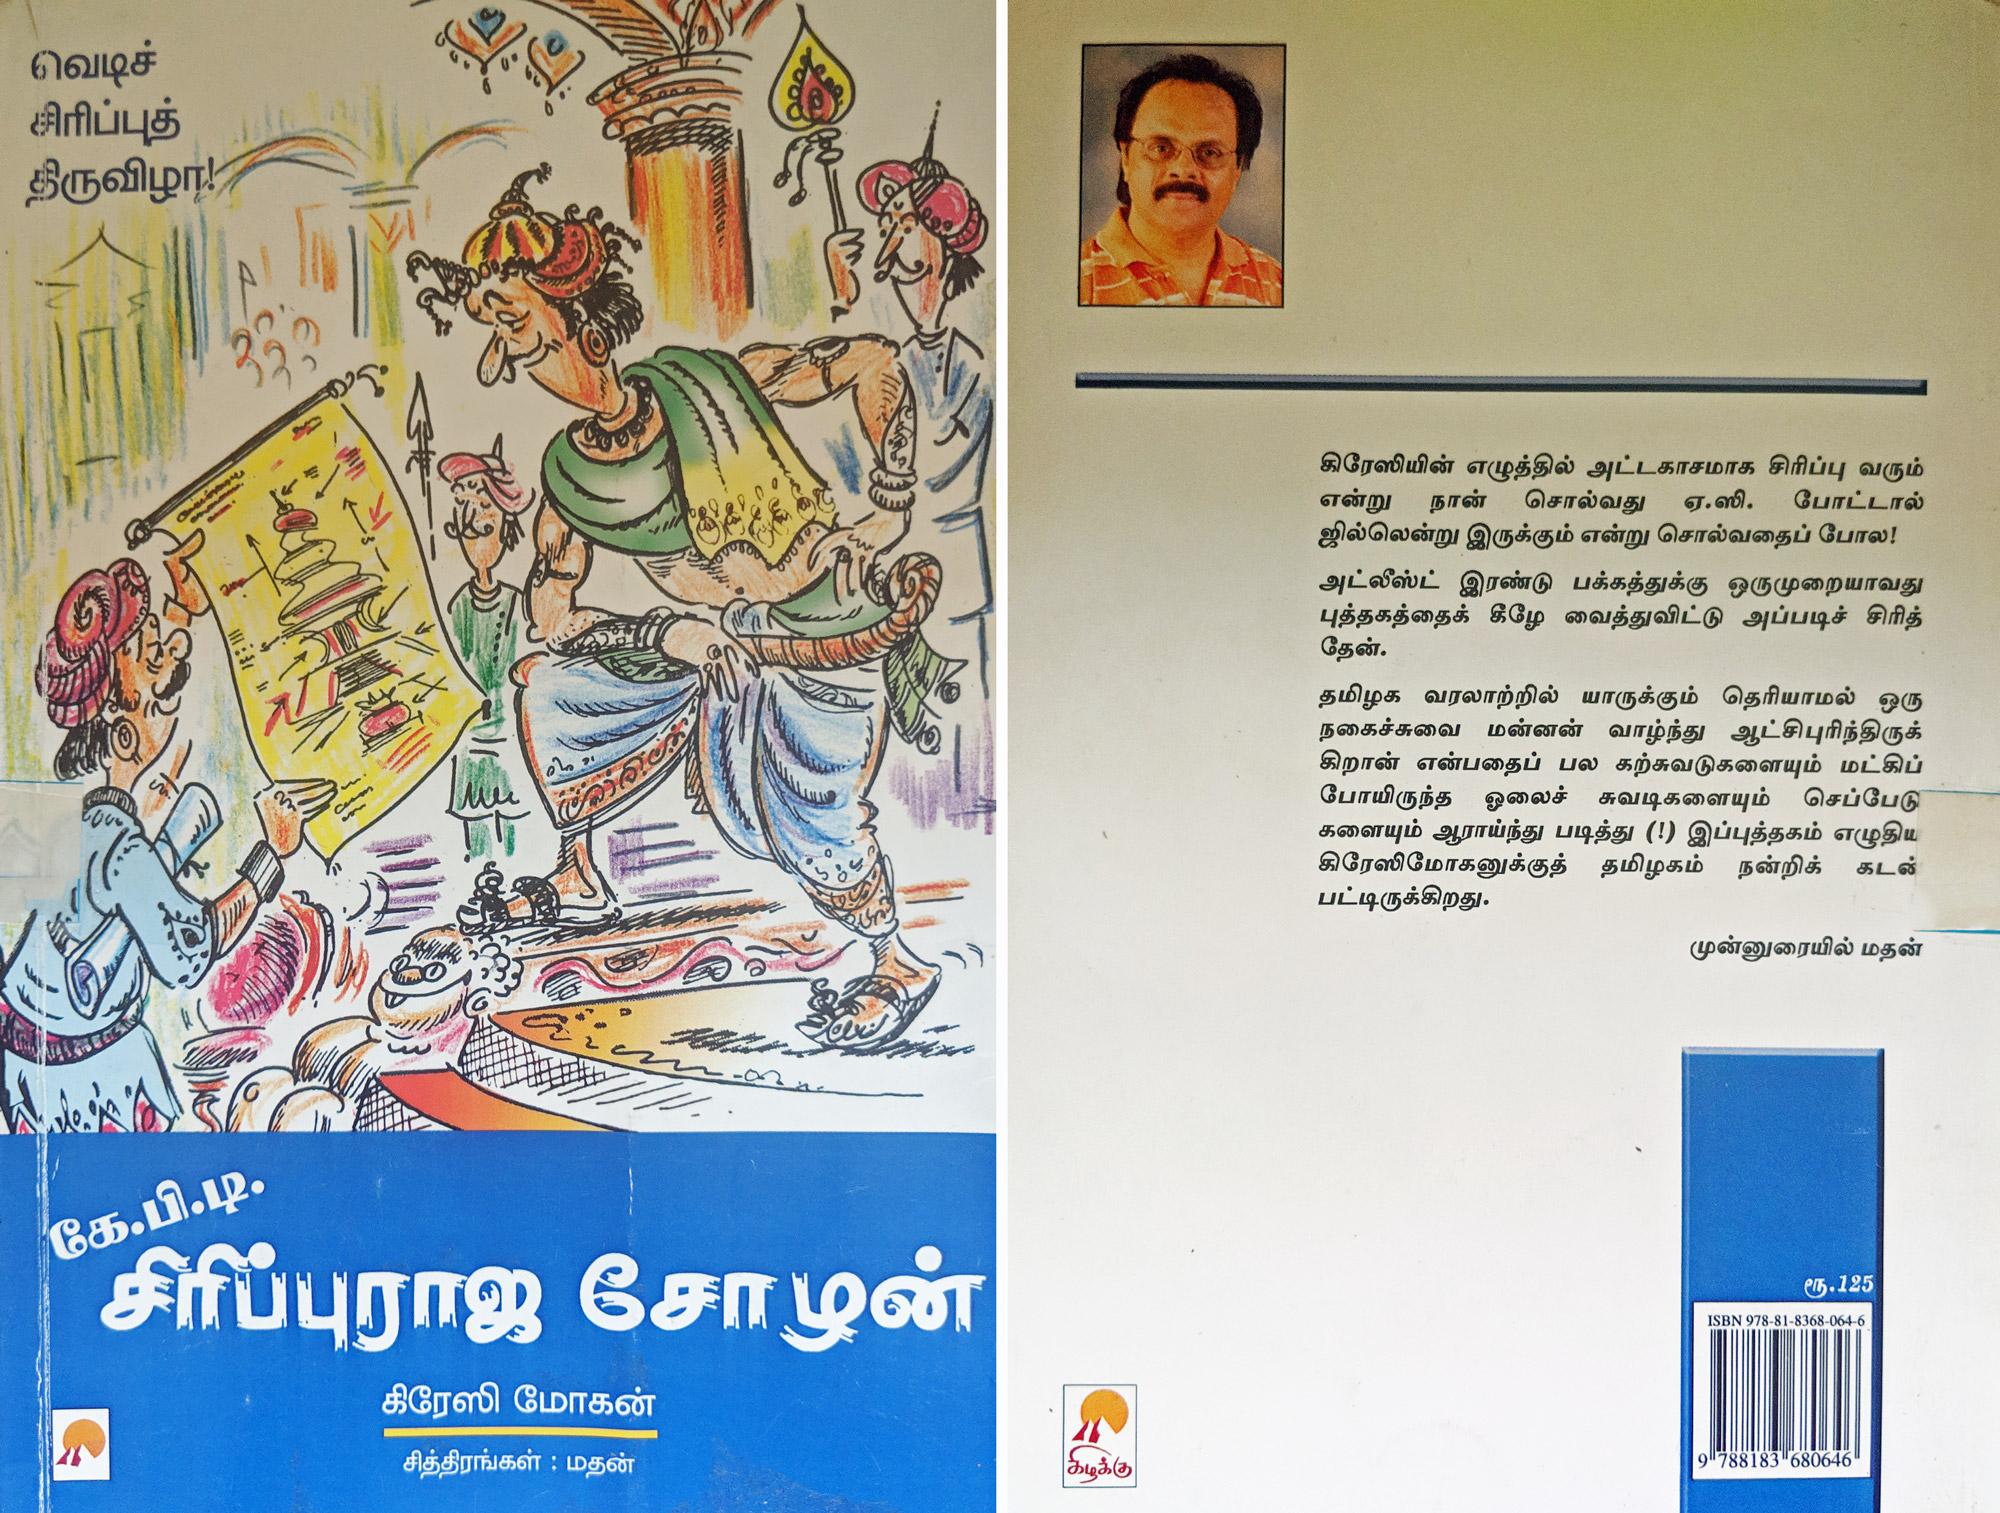 KPD Sirripuraja Chozhan by Crazy Mohan (கே.பி.டி. சிரிப்புராஜ சோழன், கிரேசி மோகன், கிழக்கு பதிப்பகம்)